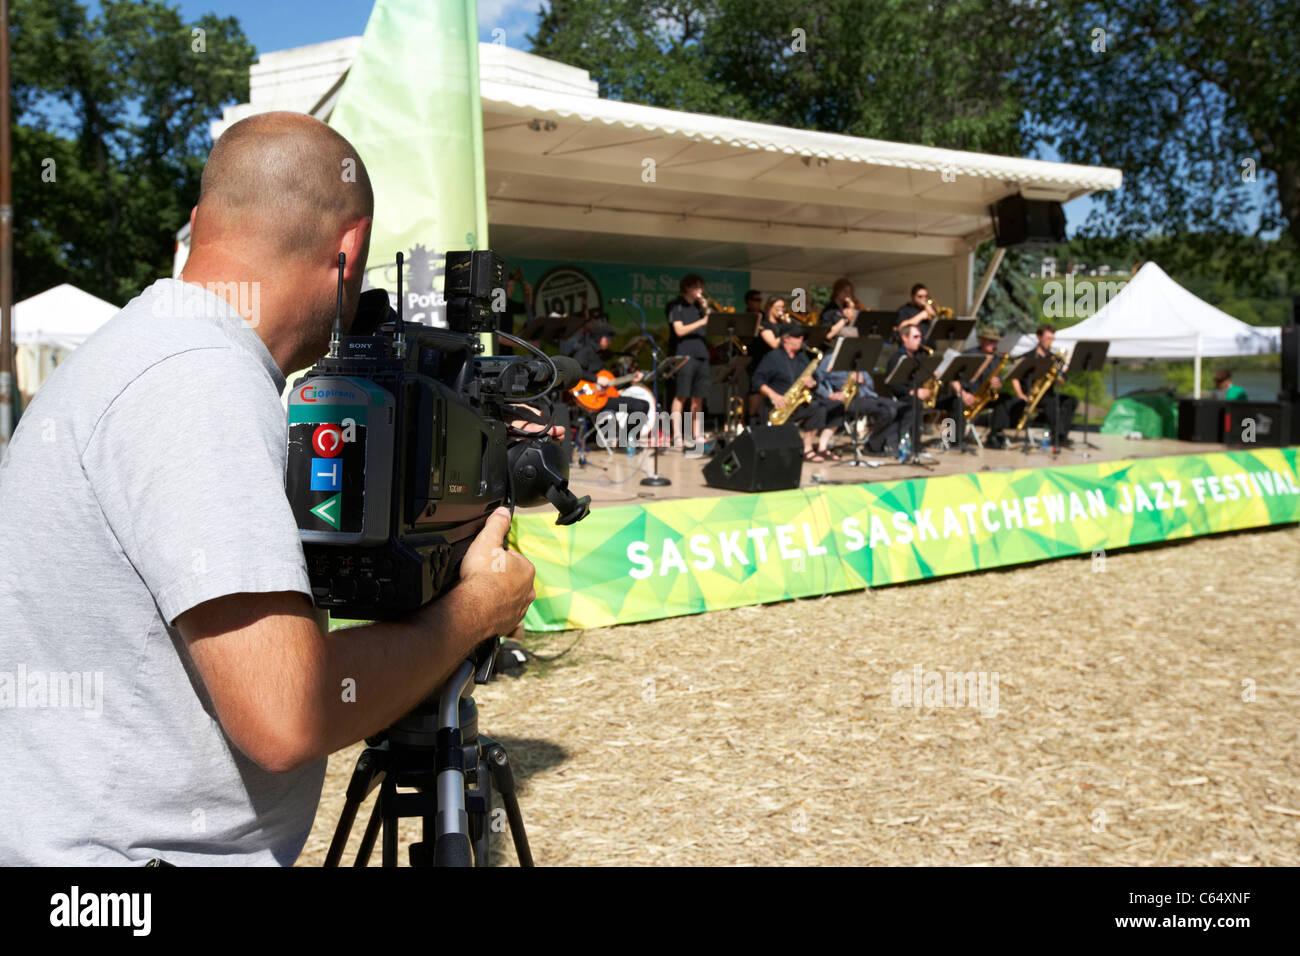 local ctv tv cameraman filming a band on stage at the sasktel Saskatoon jazz festival Saskatchewan Canada - Stock Image